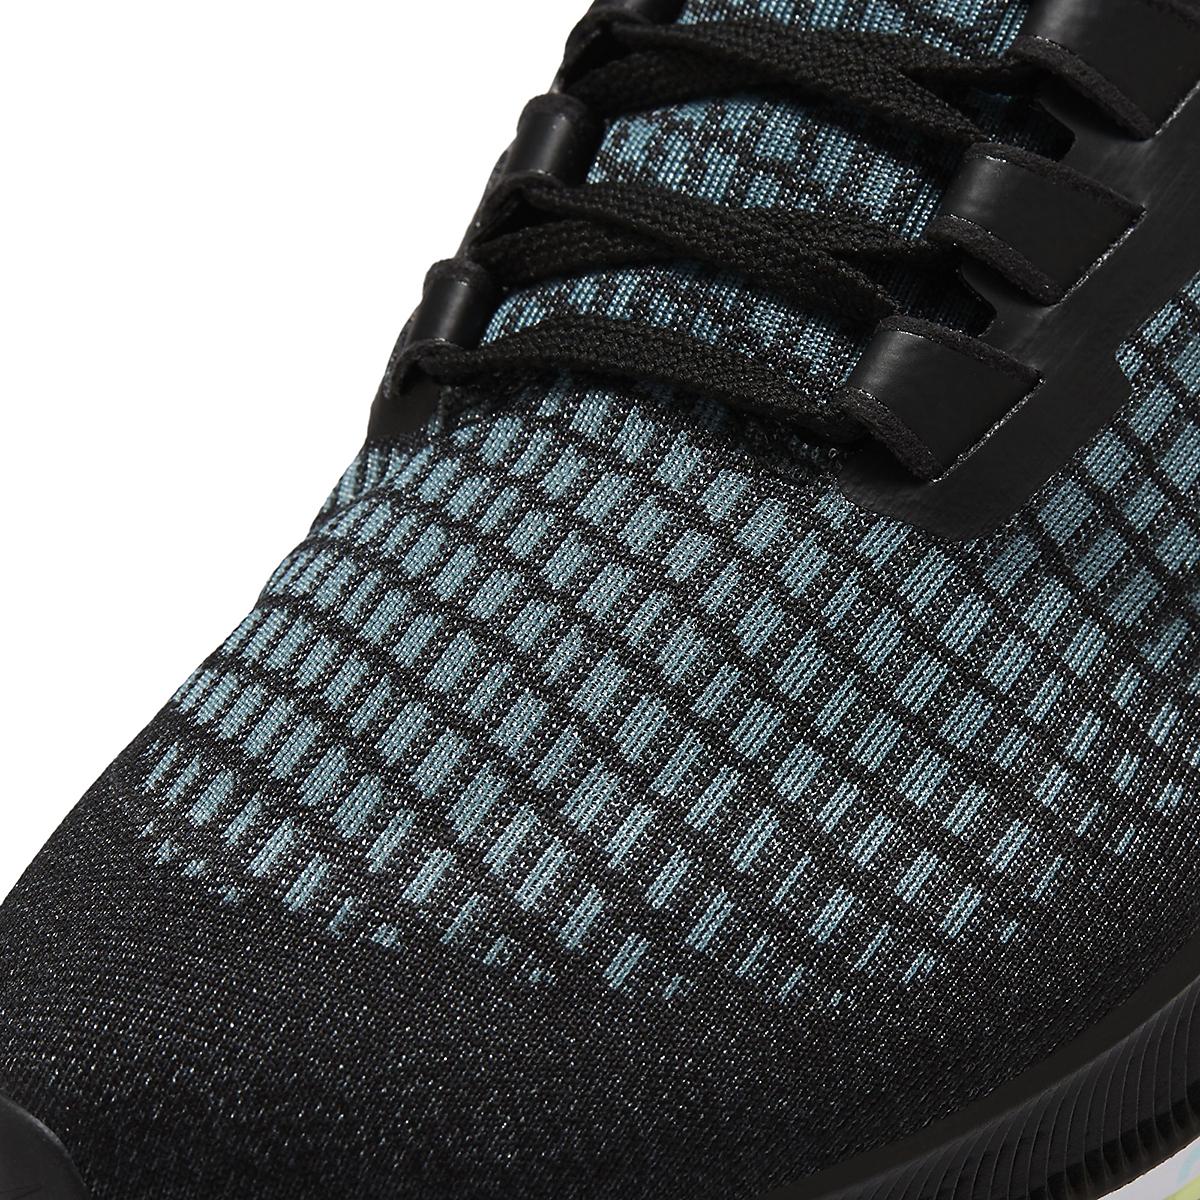 Women's Nike Air Zoom Pegasus 37 Running Shoe - Color: Black/Glacier Ice-Barely Volt-White - Size: 6 - Width: Regular, Black/Glacier Ice-Barely Volt-White, large, image 7